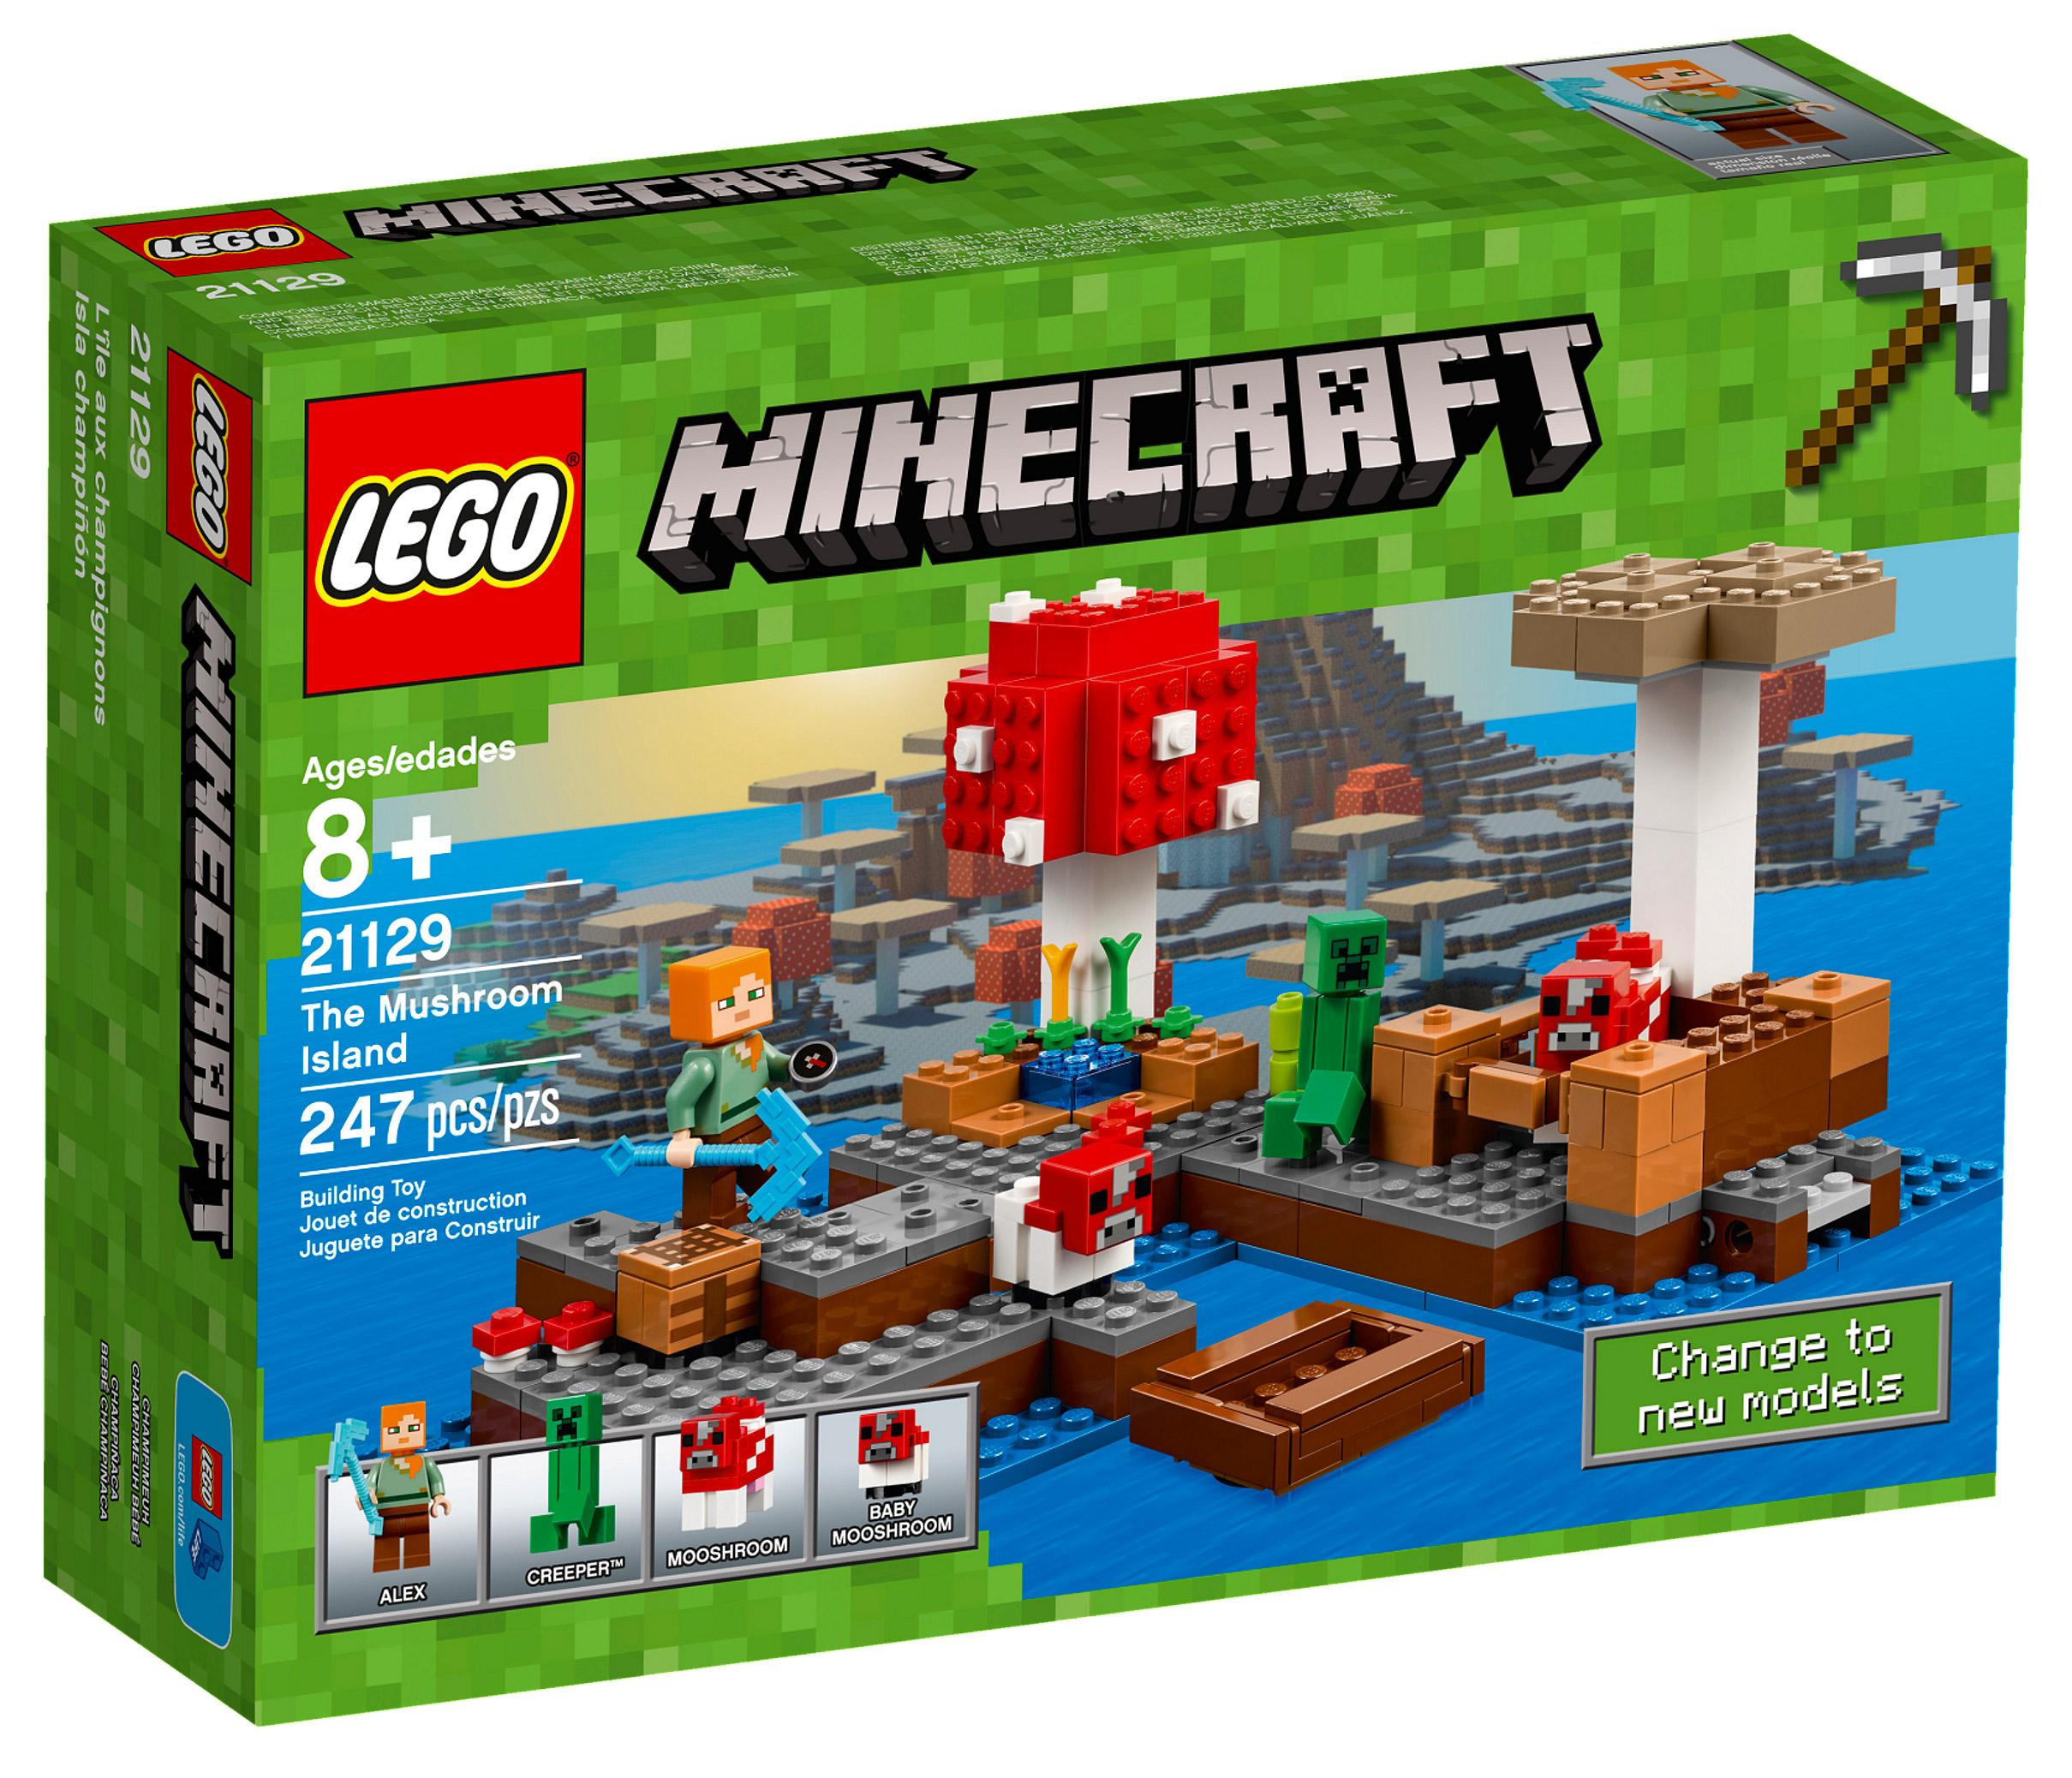 lego minecraft 21129 pas cher le biome champignon. Black Bedroom Furniture Sets. Home Design Ideas